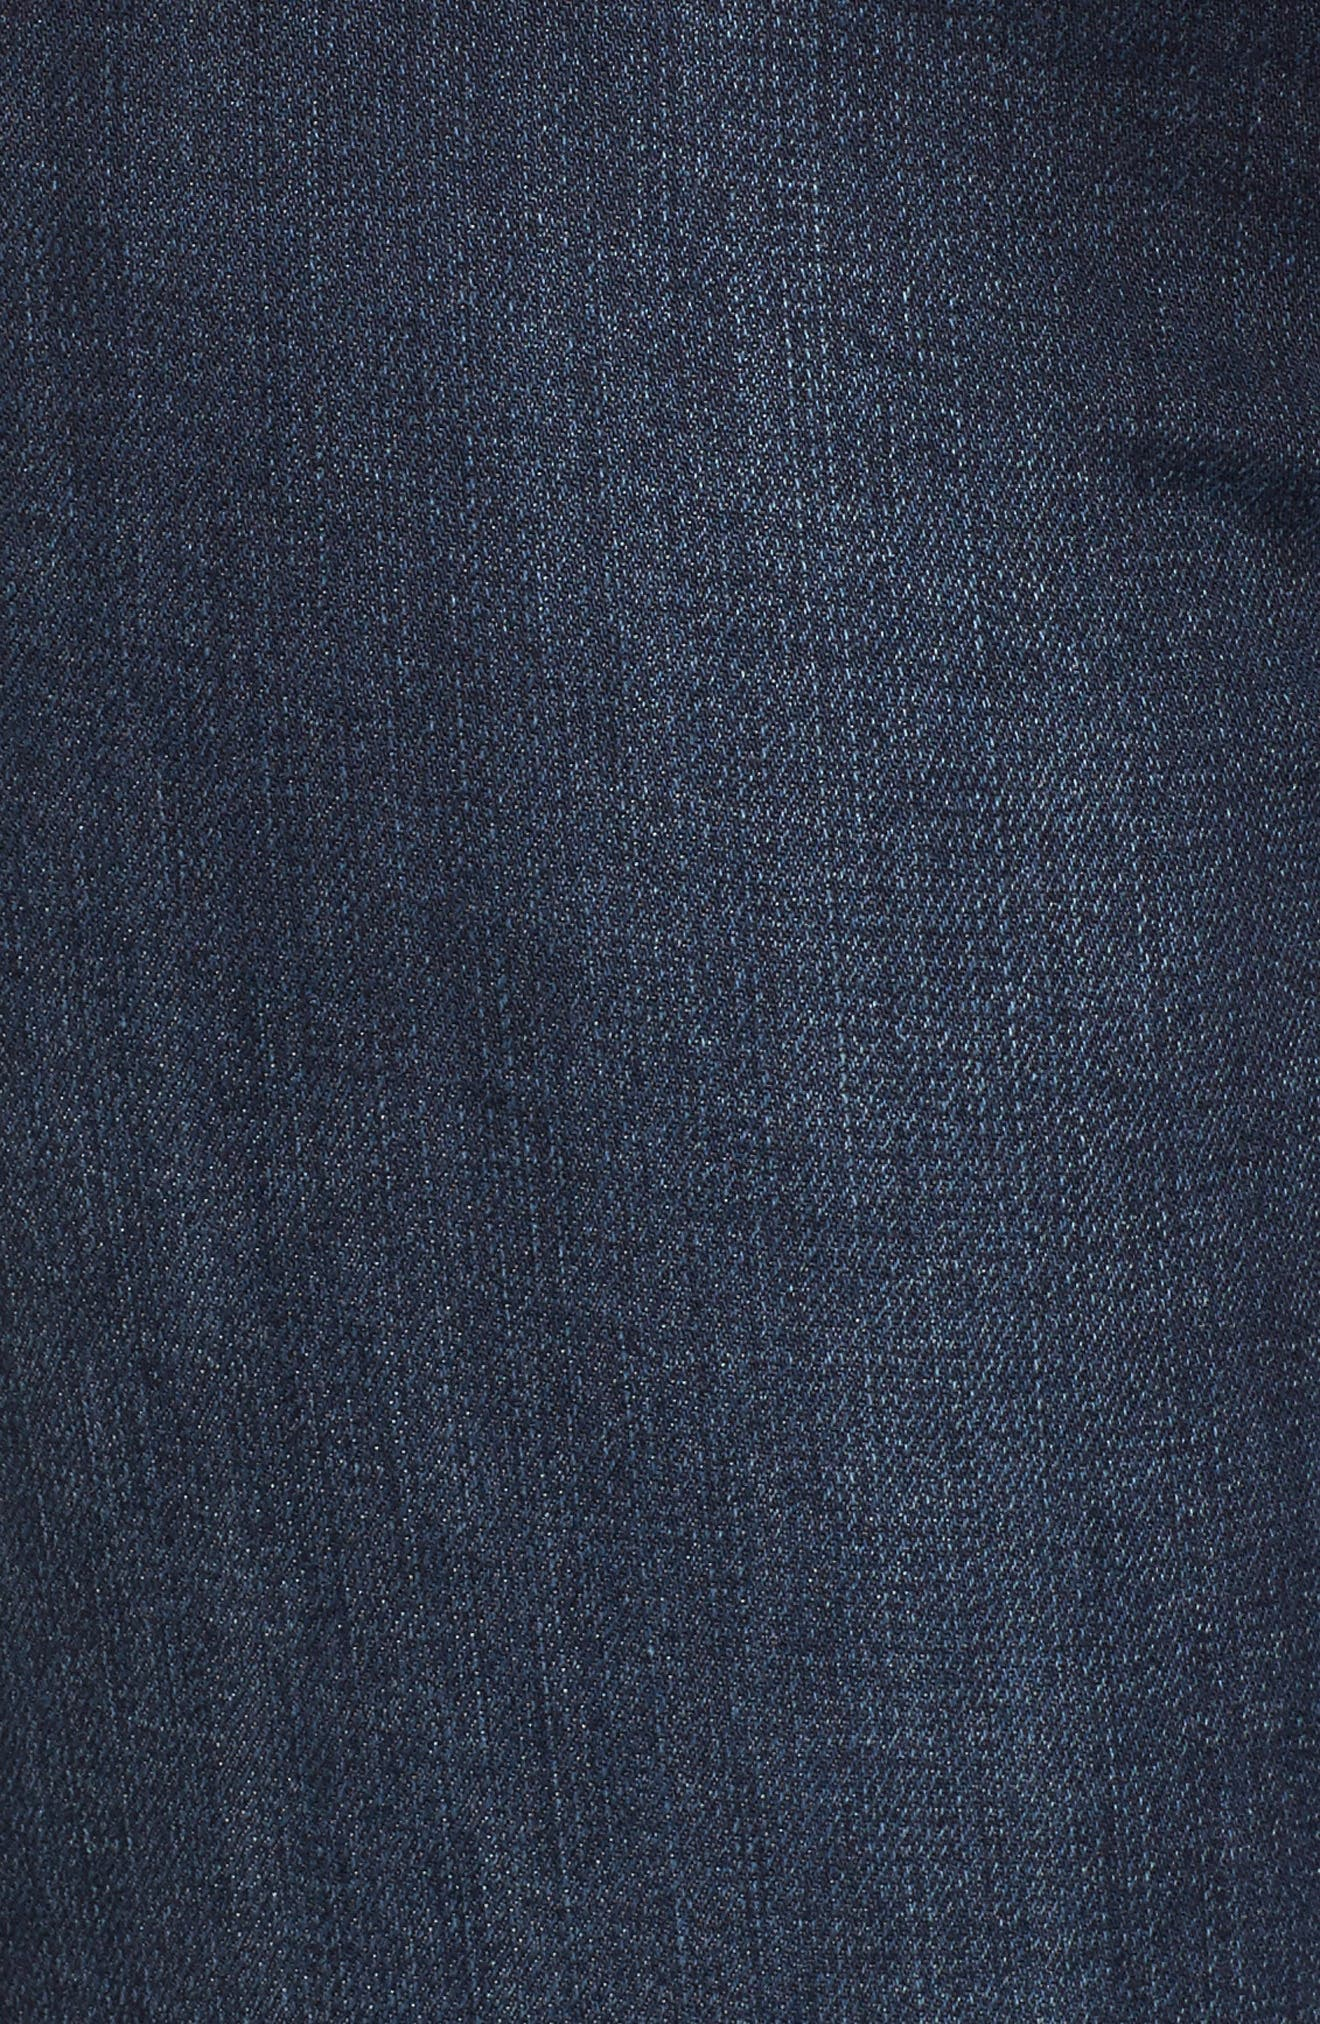 Natalie High Waist Bootcut Jeans,                             Alternate thumbnail 5, color,                             453